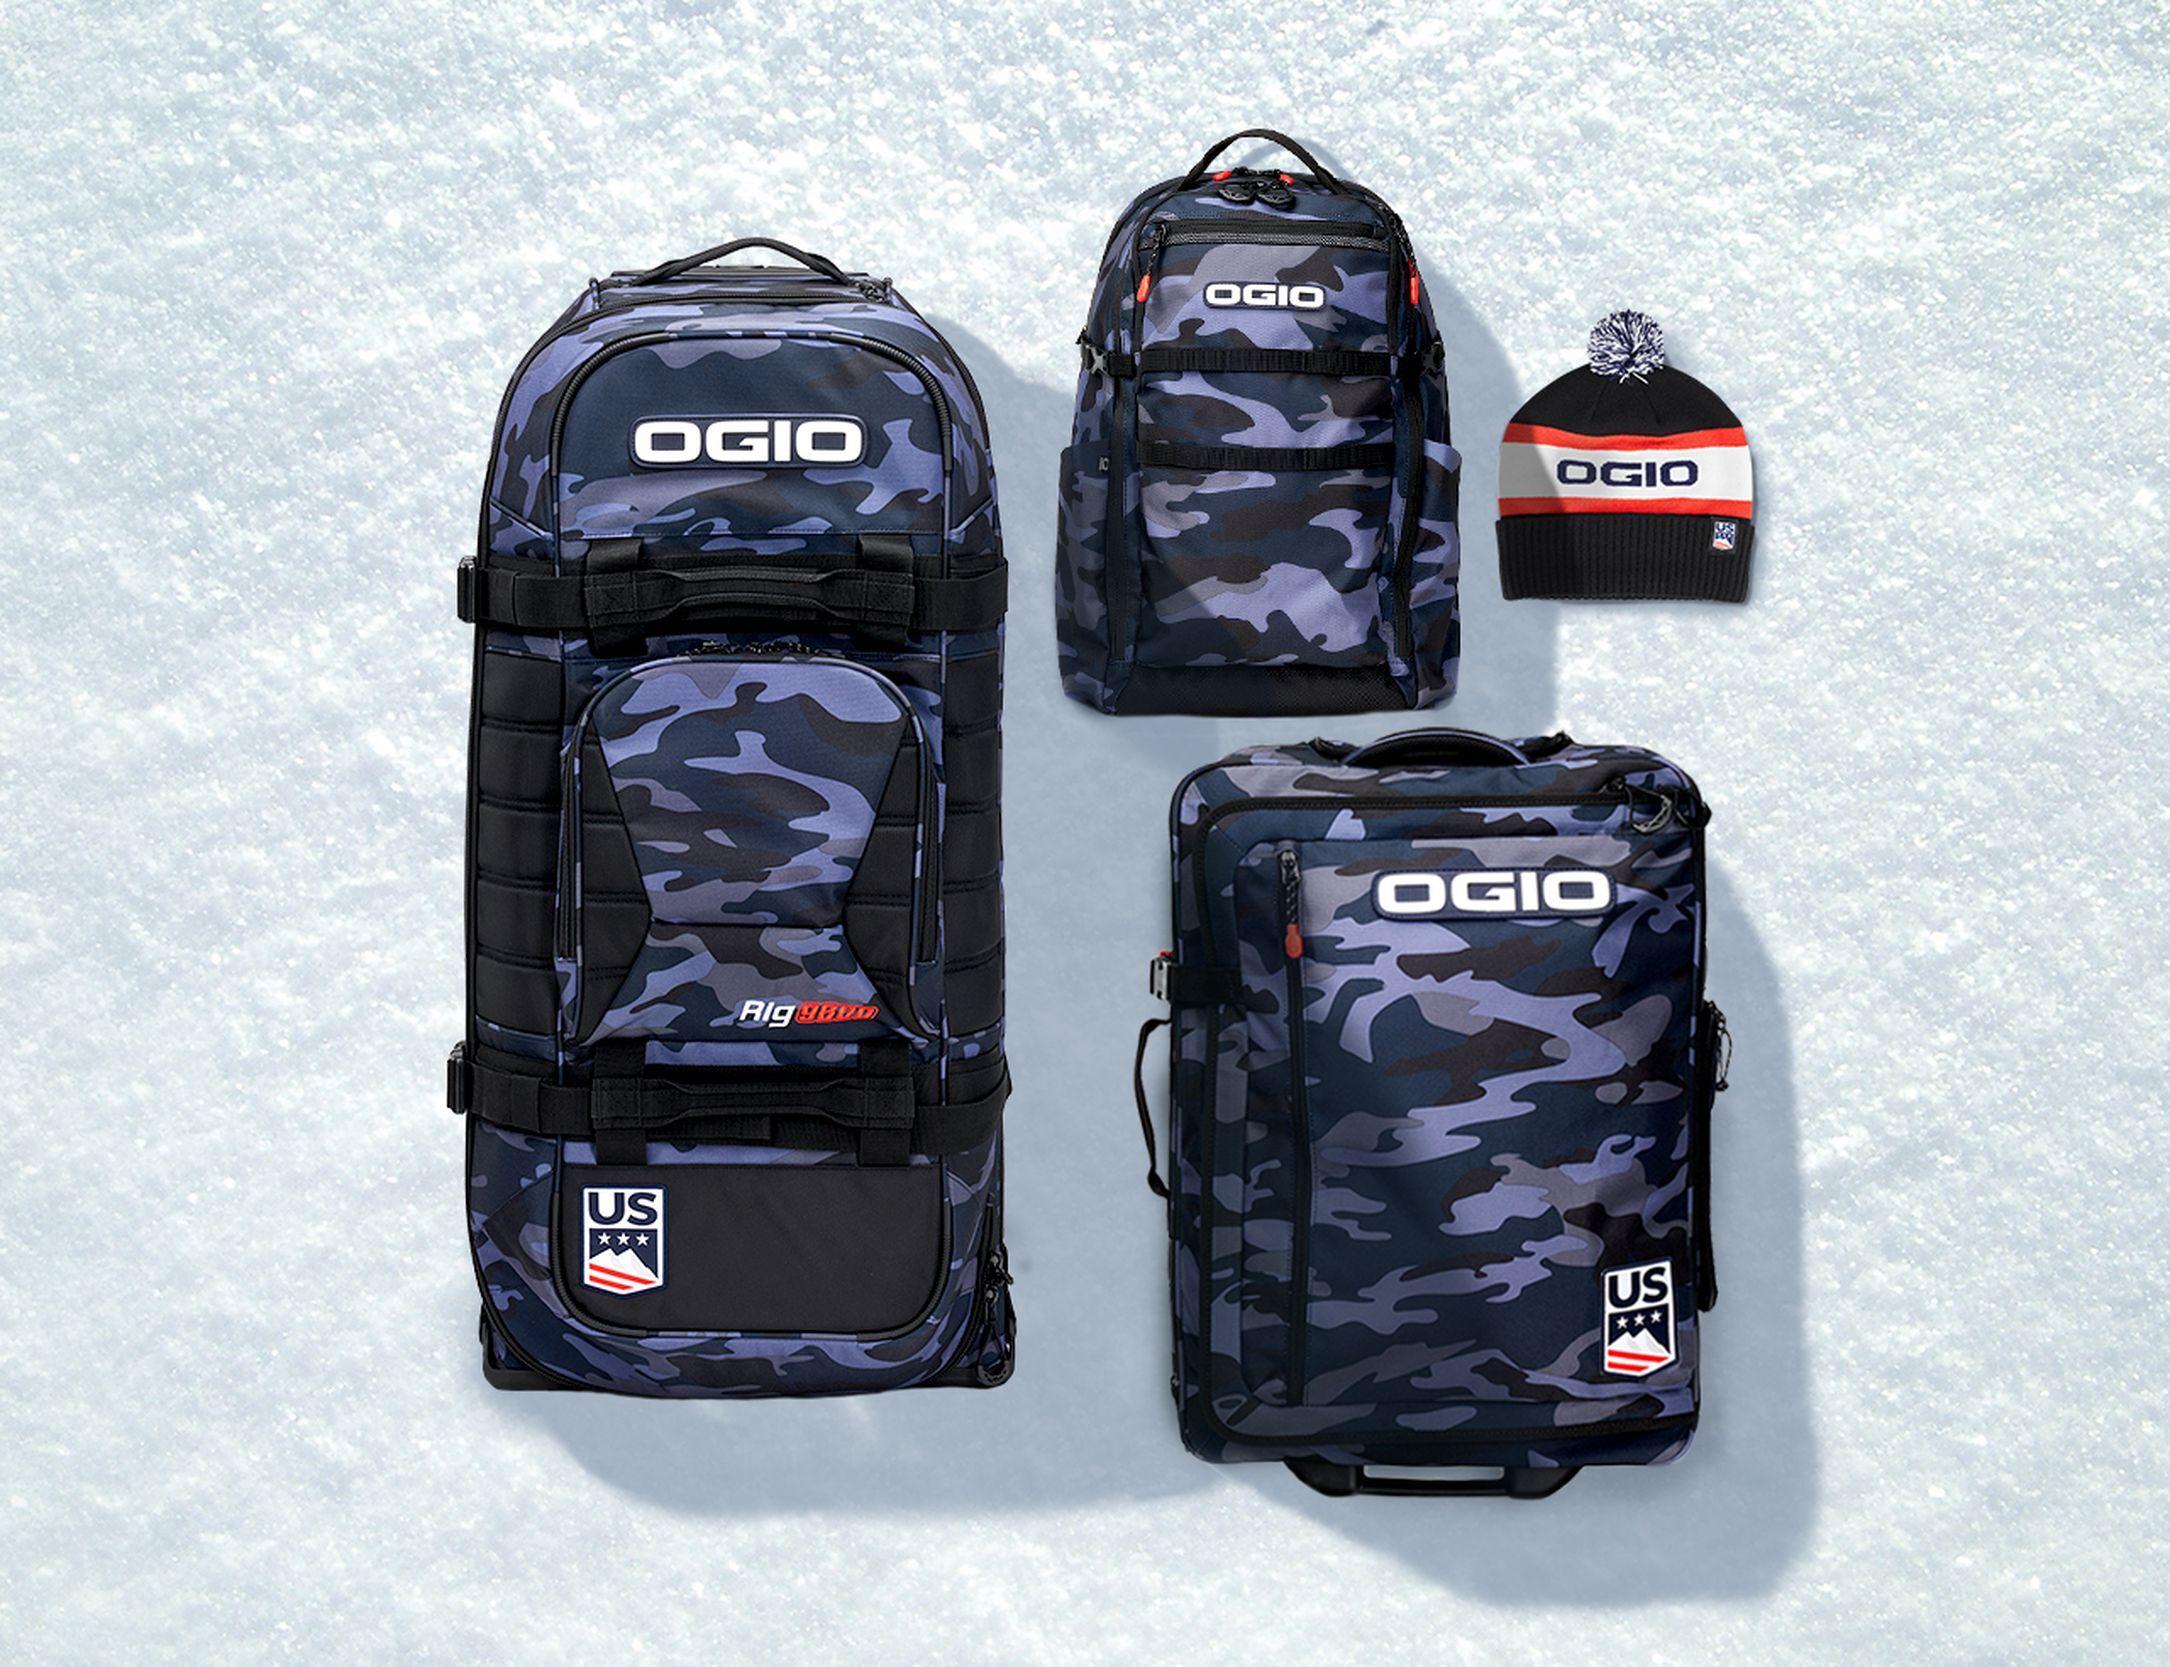 U.S Ski & Snowboard Collection